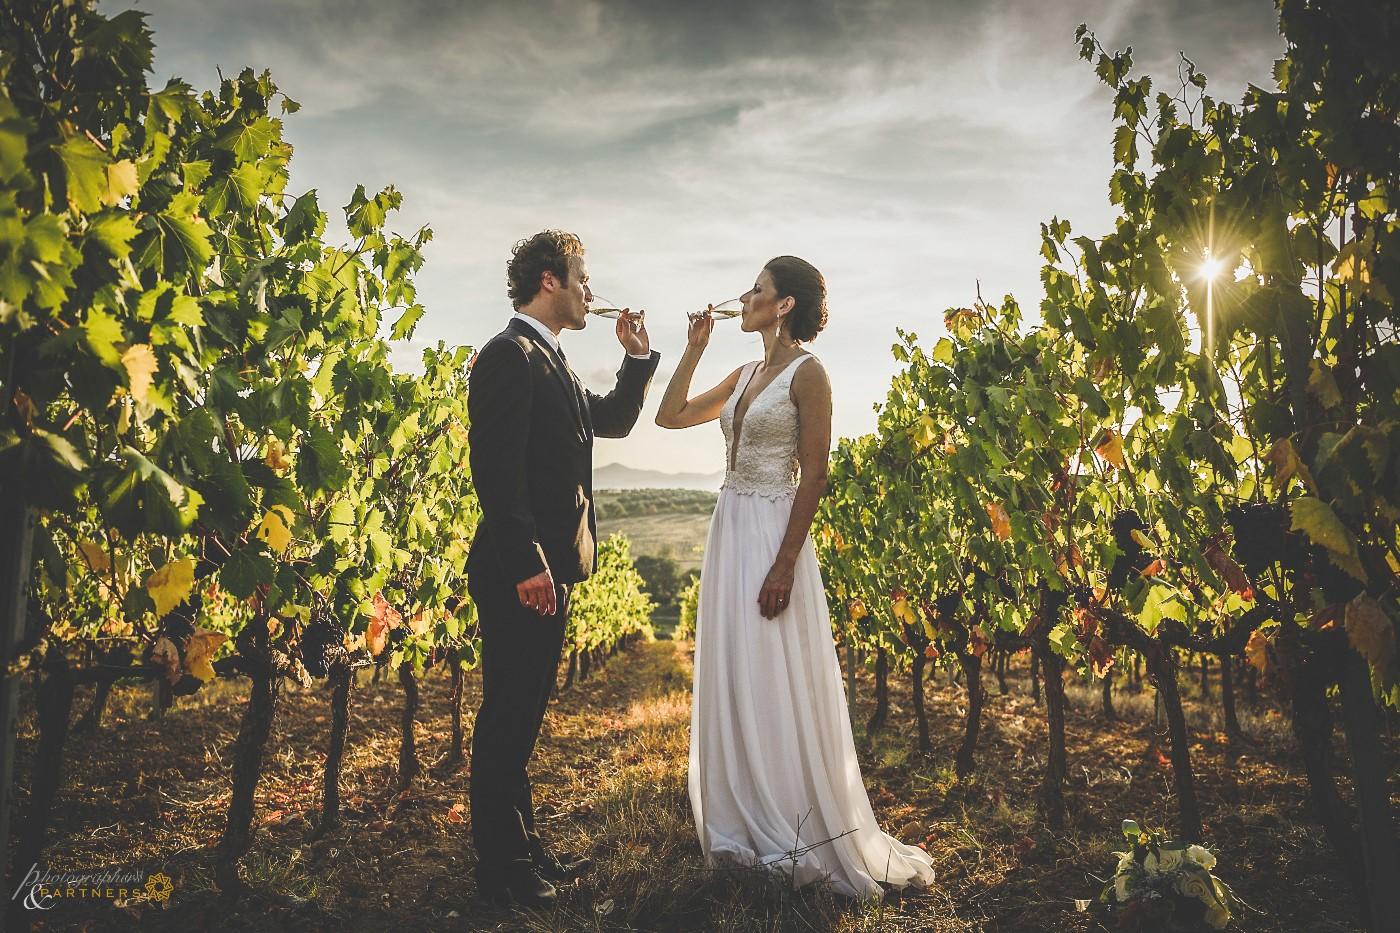 photographer_weddings_montepulciano_14.jpg